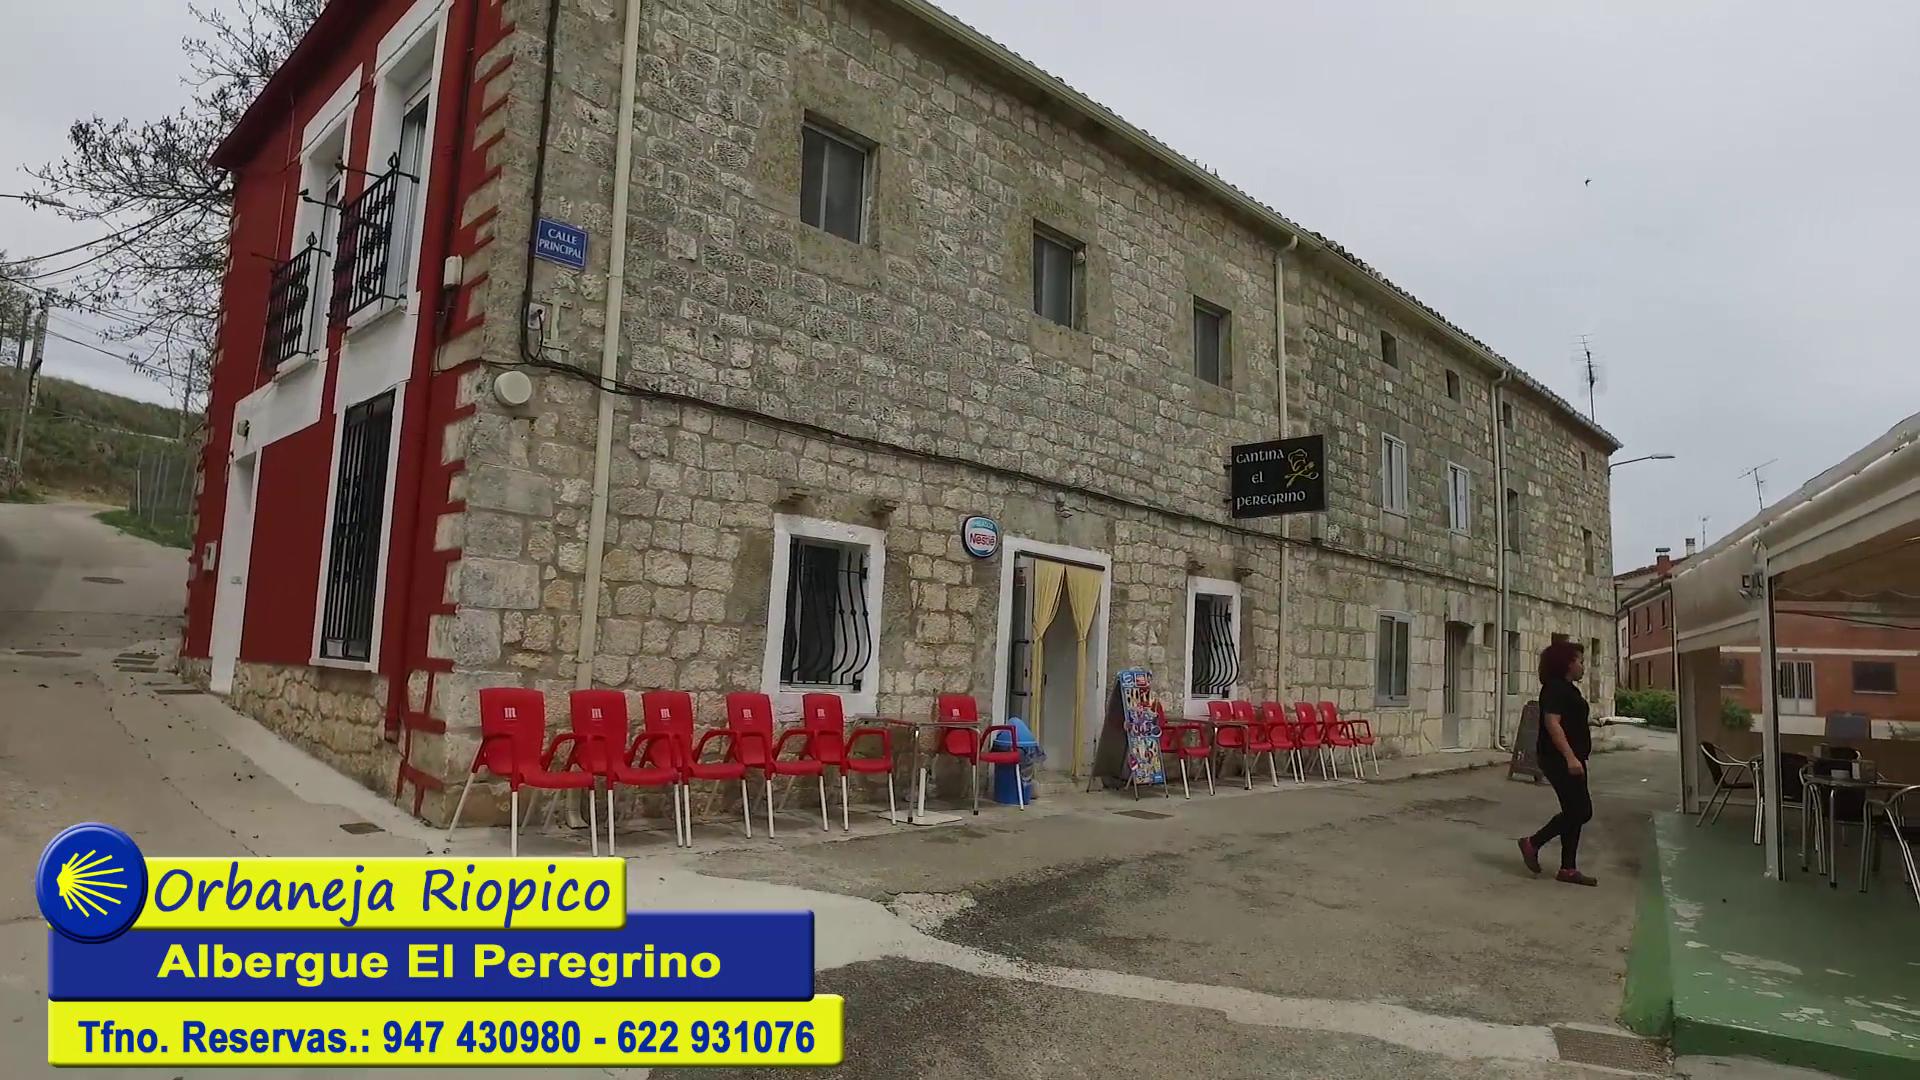 Orbaneja Riopico Albergue Municipal